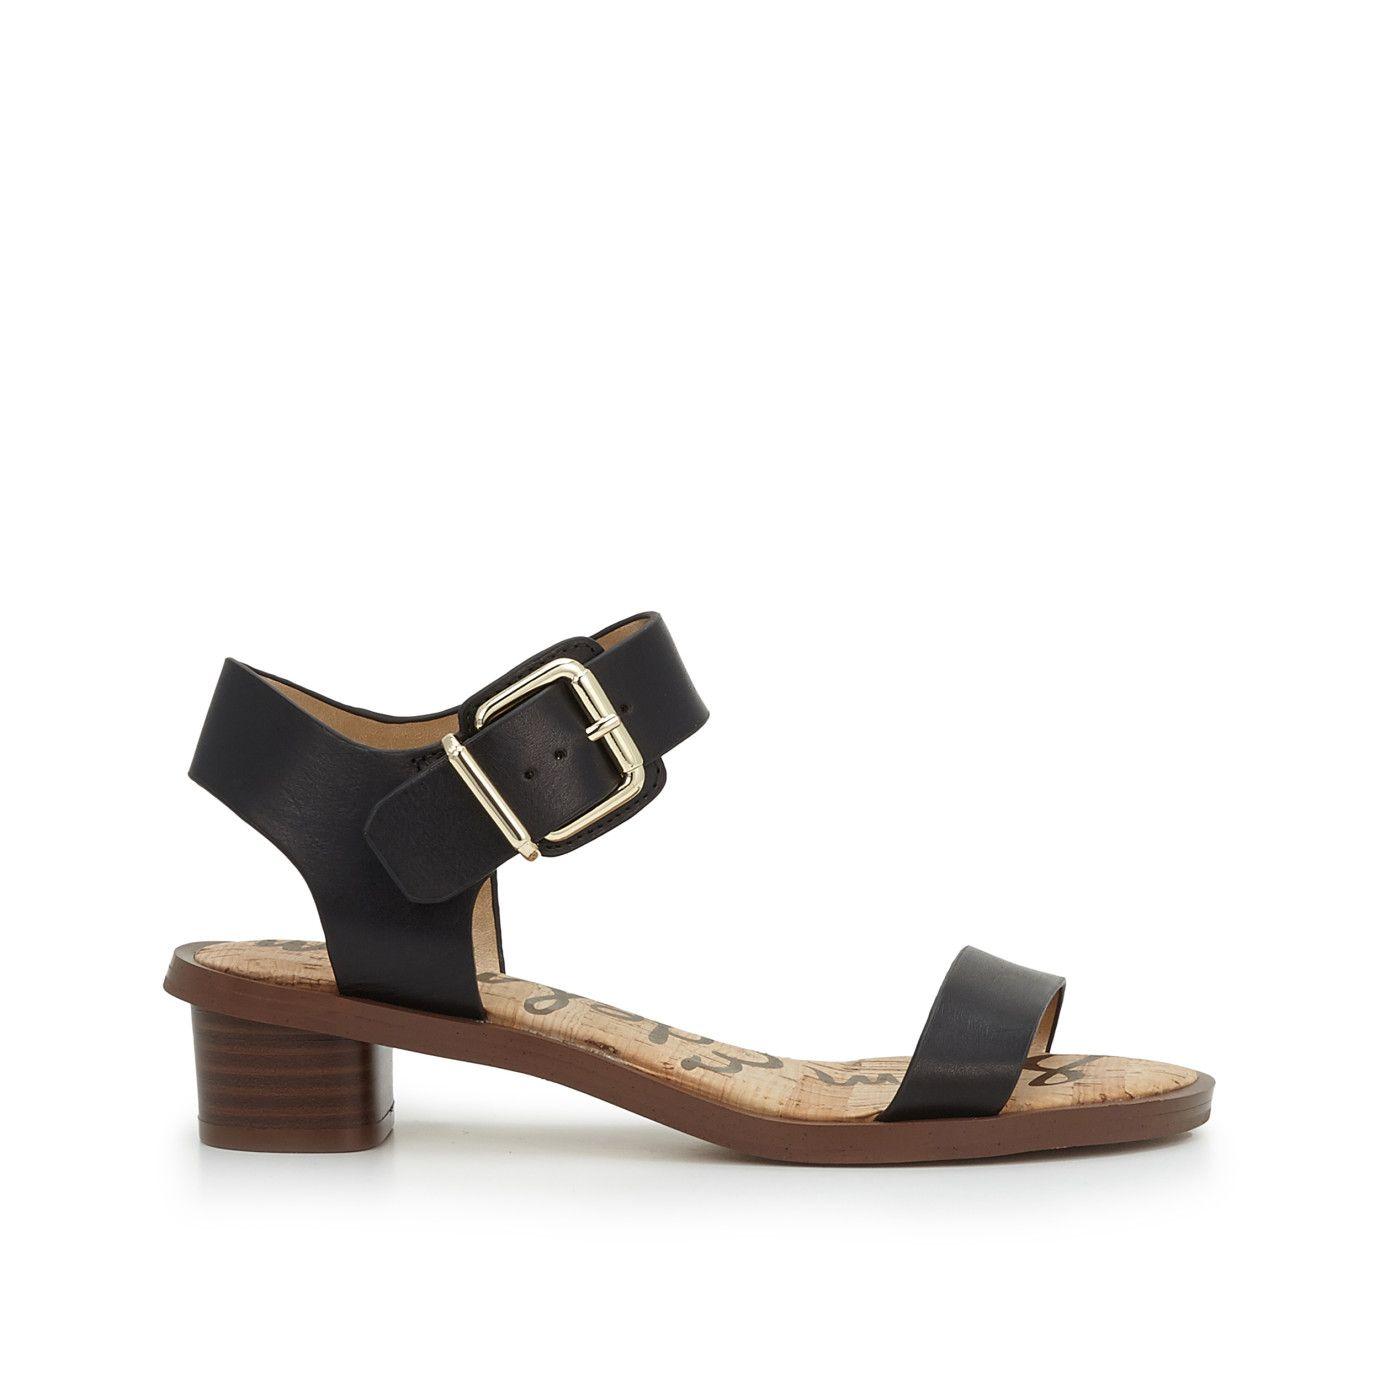 df56f1a47 Trina Block Heel Sandal by Sam Edelman - Black Leather